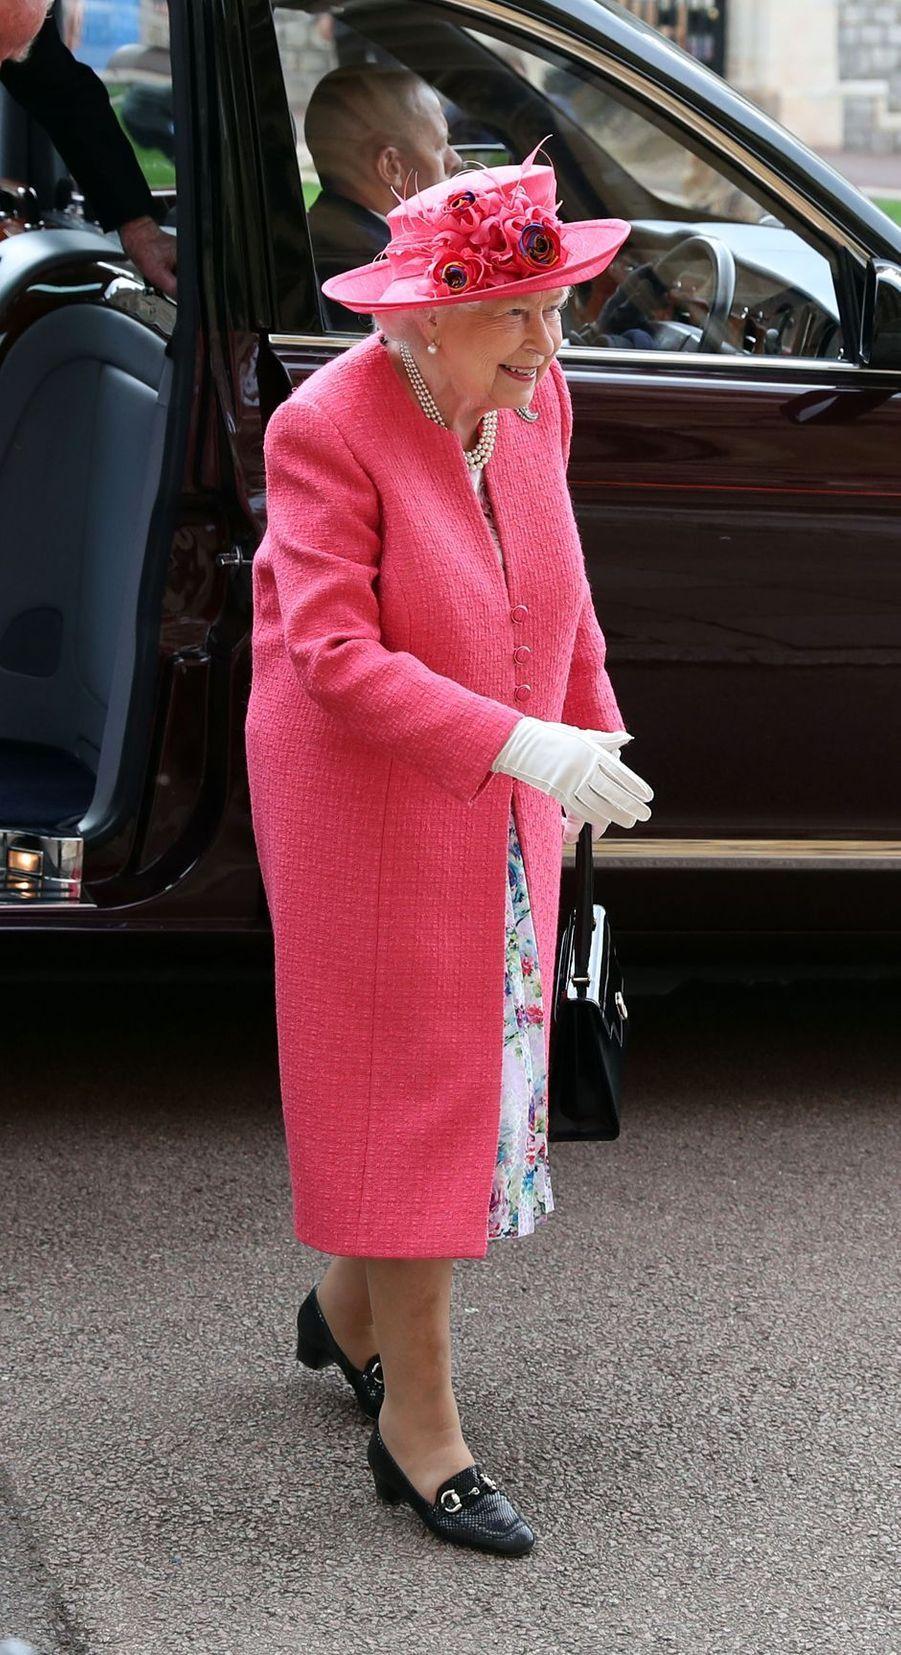 La reine Elizabeth II au mariage de Lady Gabriella à Windsor, le 18 mai 2019